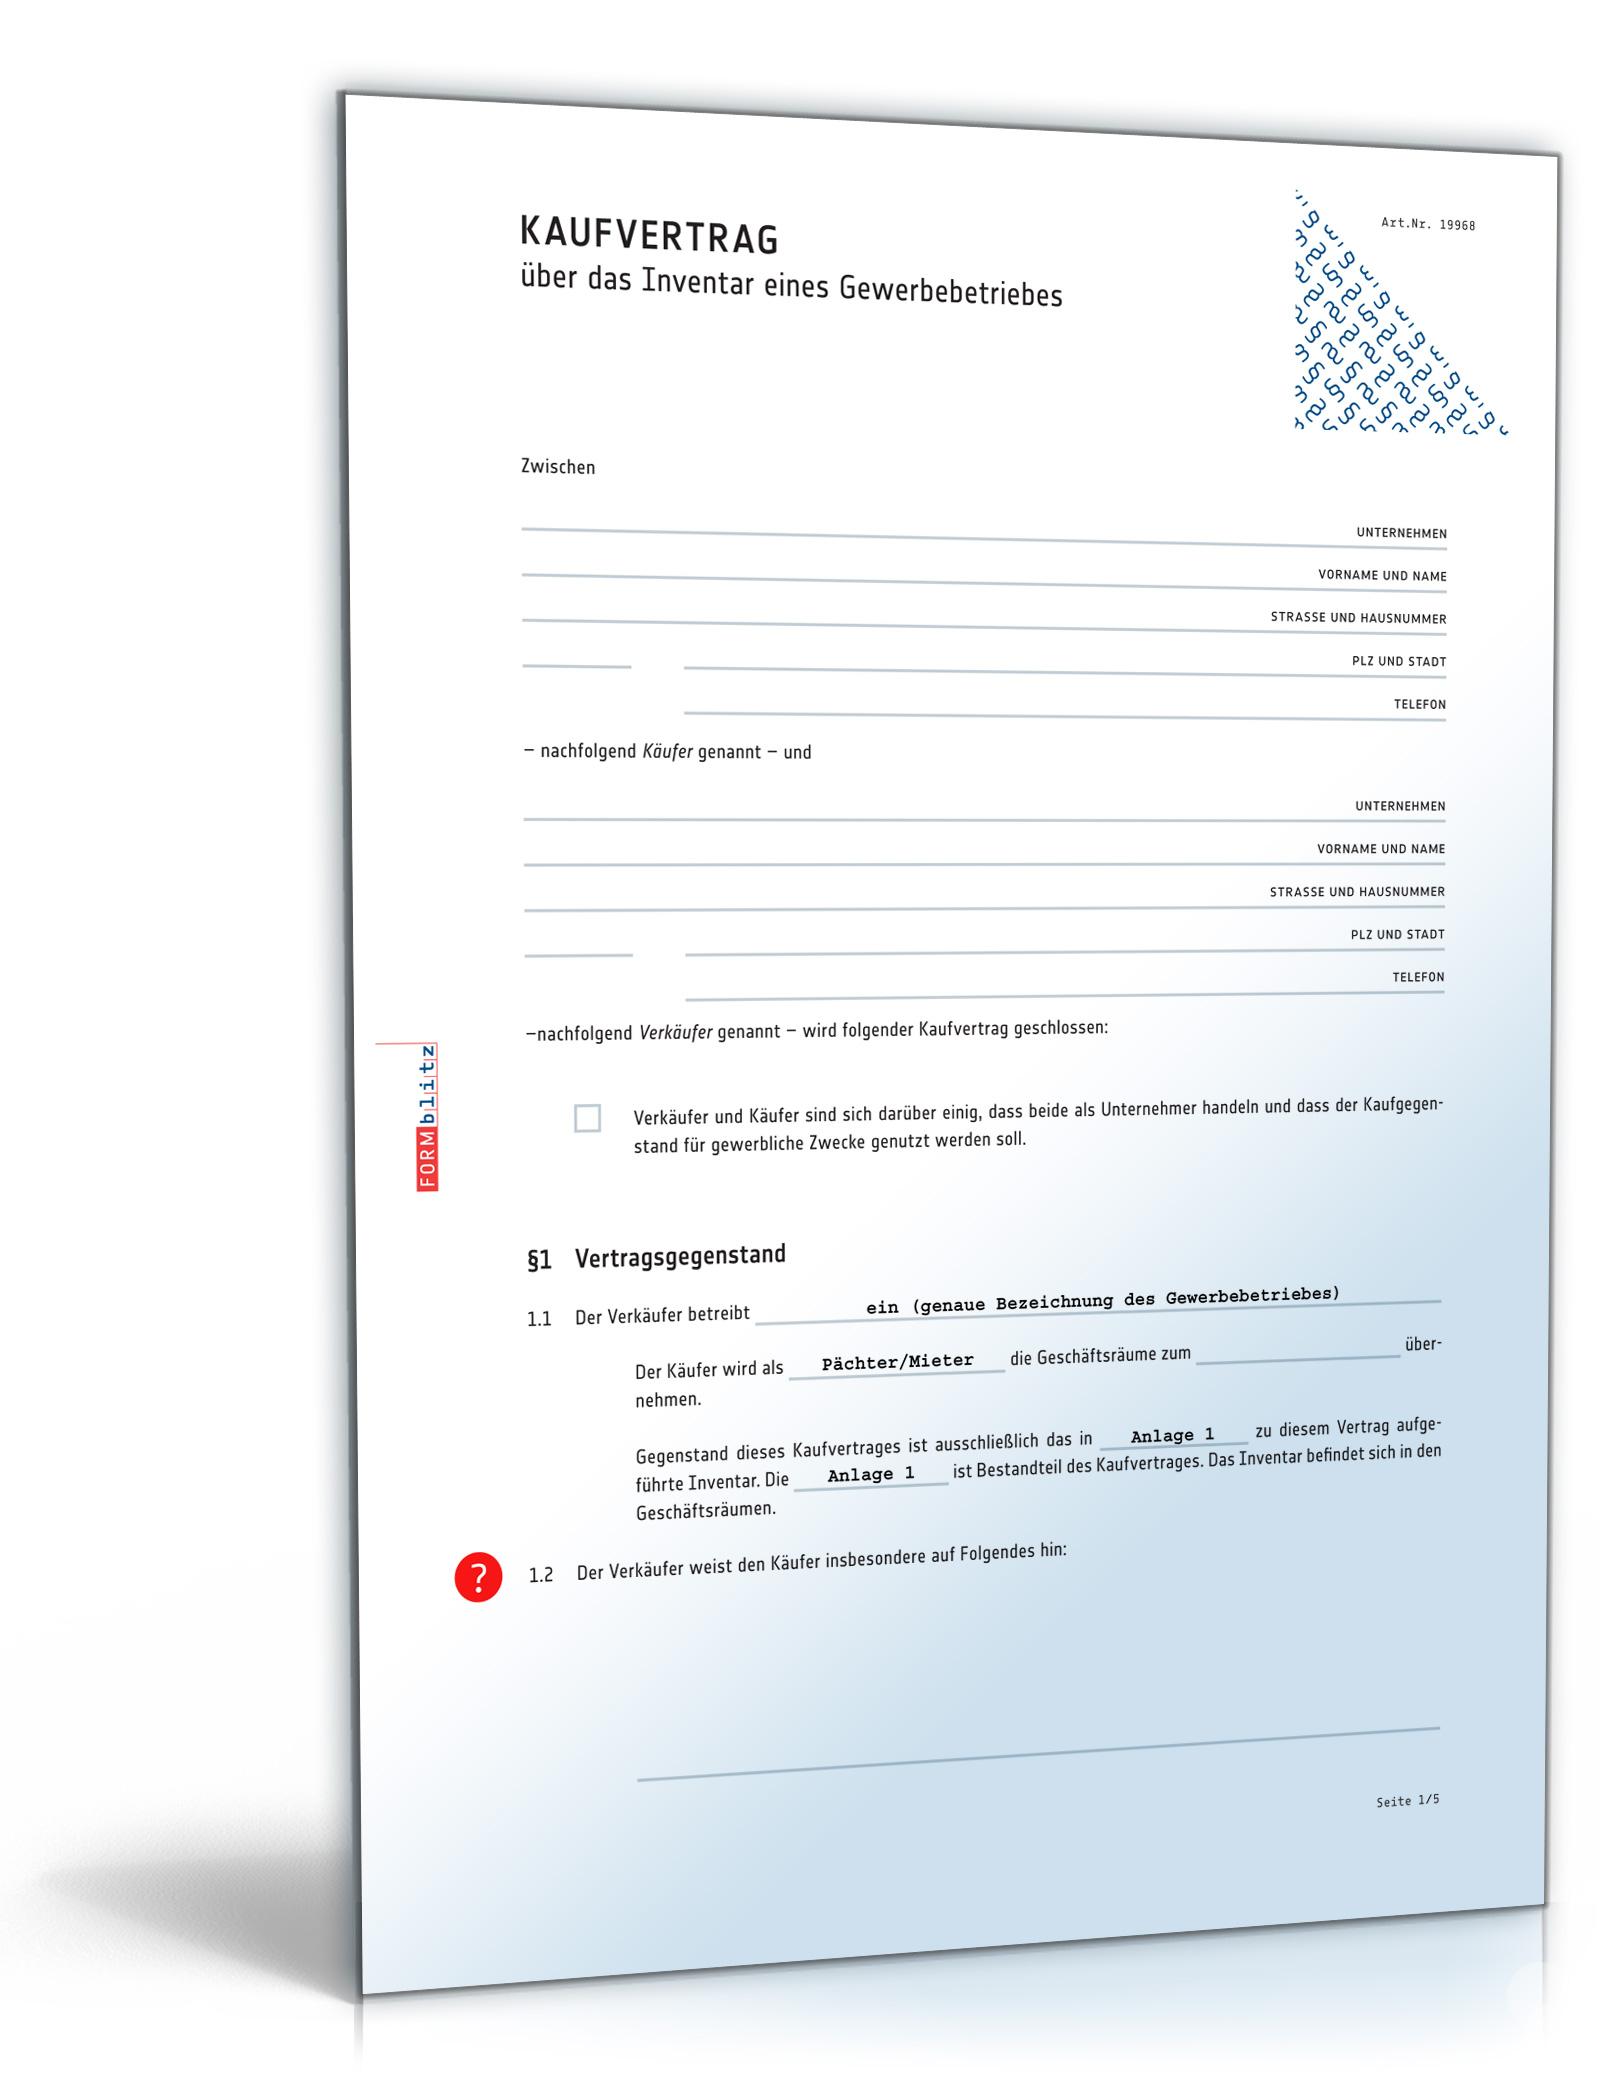 Kaufvertrag Inventar Gewerbebetrieb [Download]: Amazon.de: Software